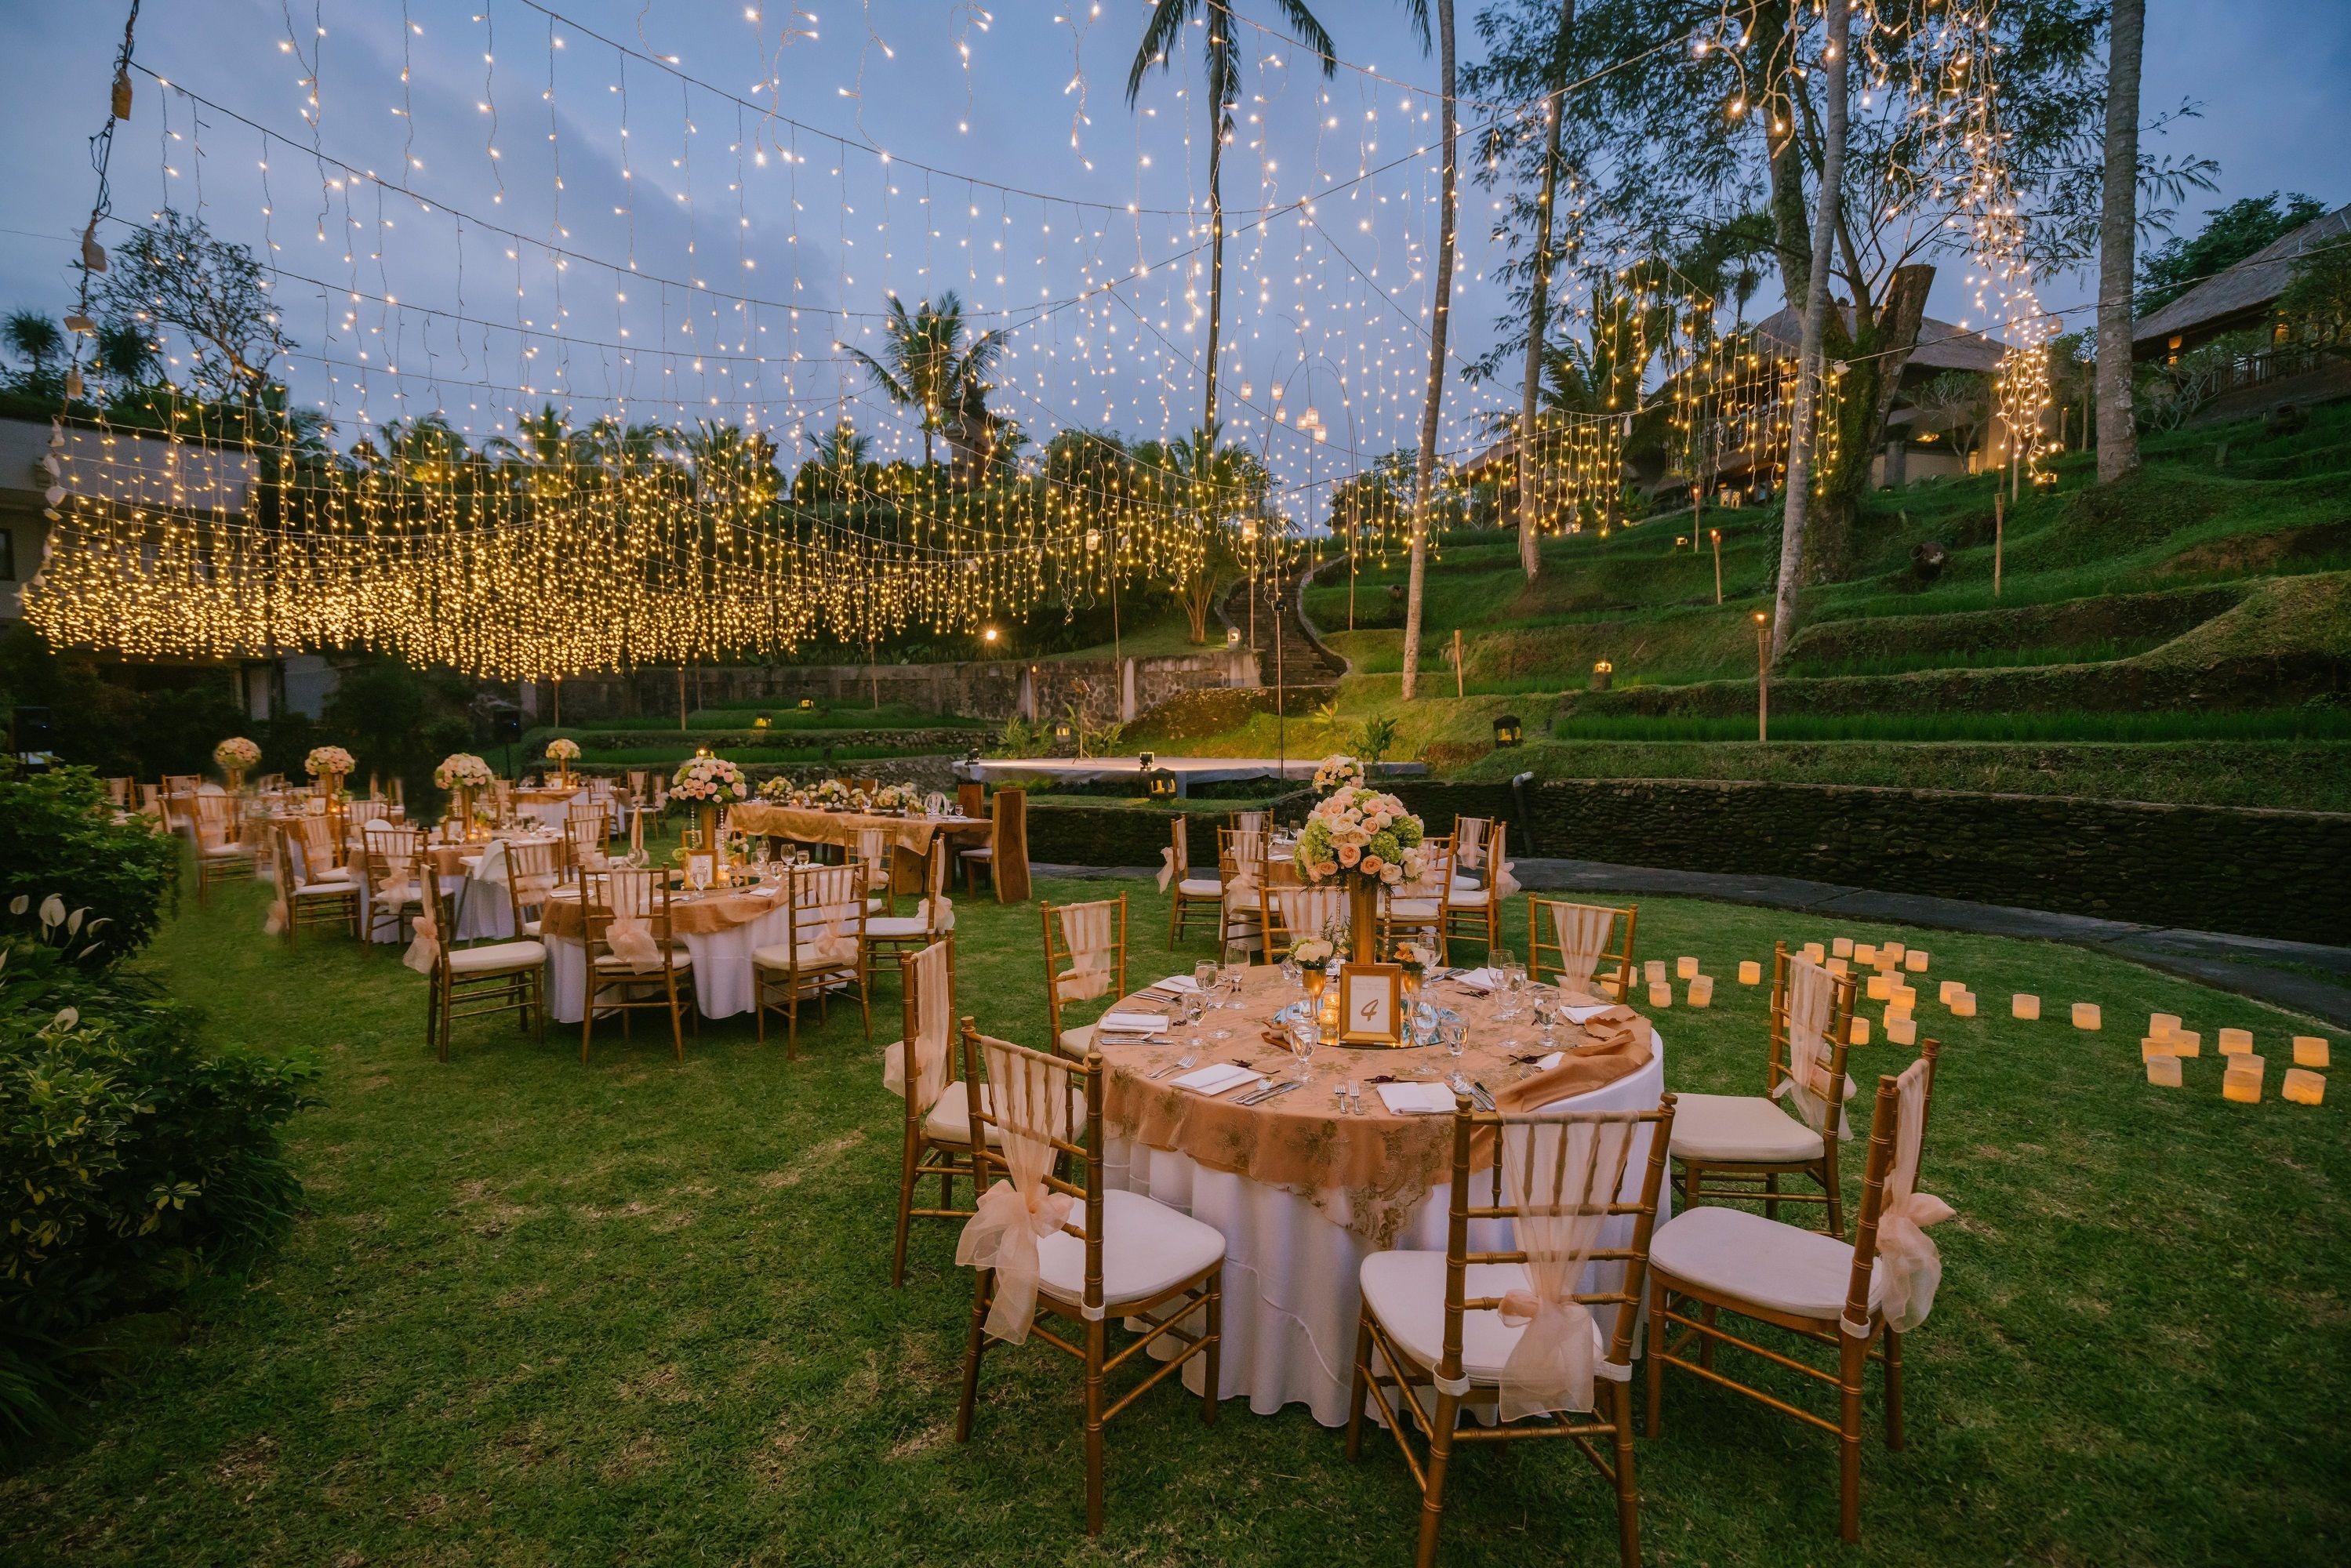 Special Wedding Dinner At Kamandalu Ubud Wedding Organizer Planner Wedding Planning Business Romantic Wedding Venue - Wedding Ubud, Weddings Events Capella Ubud Bali